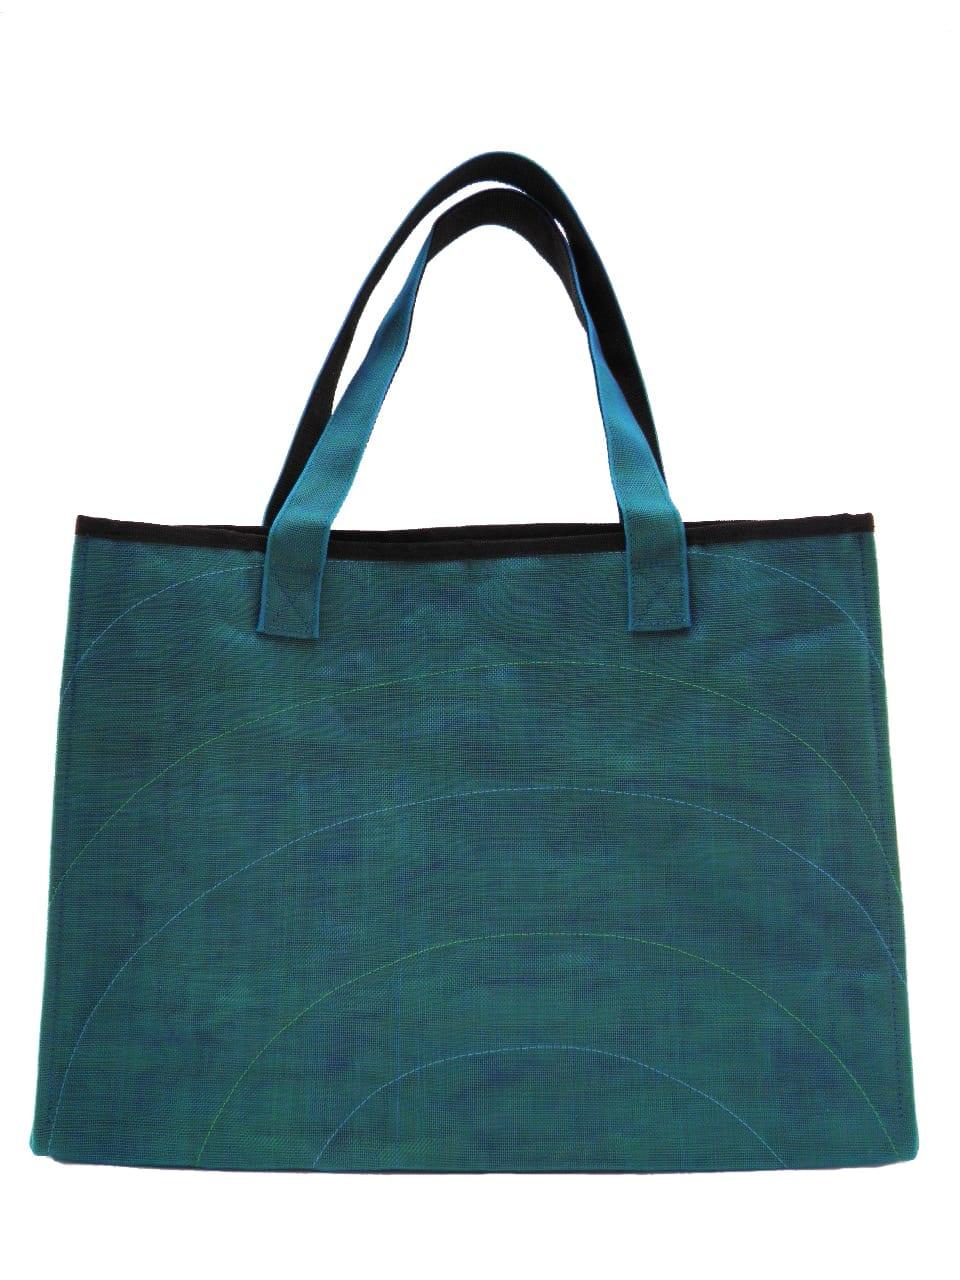 Random Admin - Tote bag - Petrol blue - verso